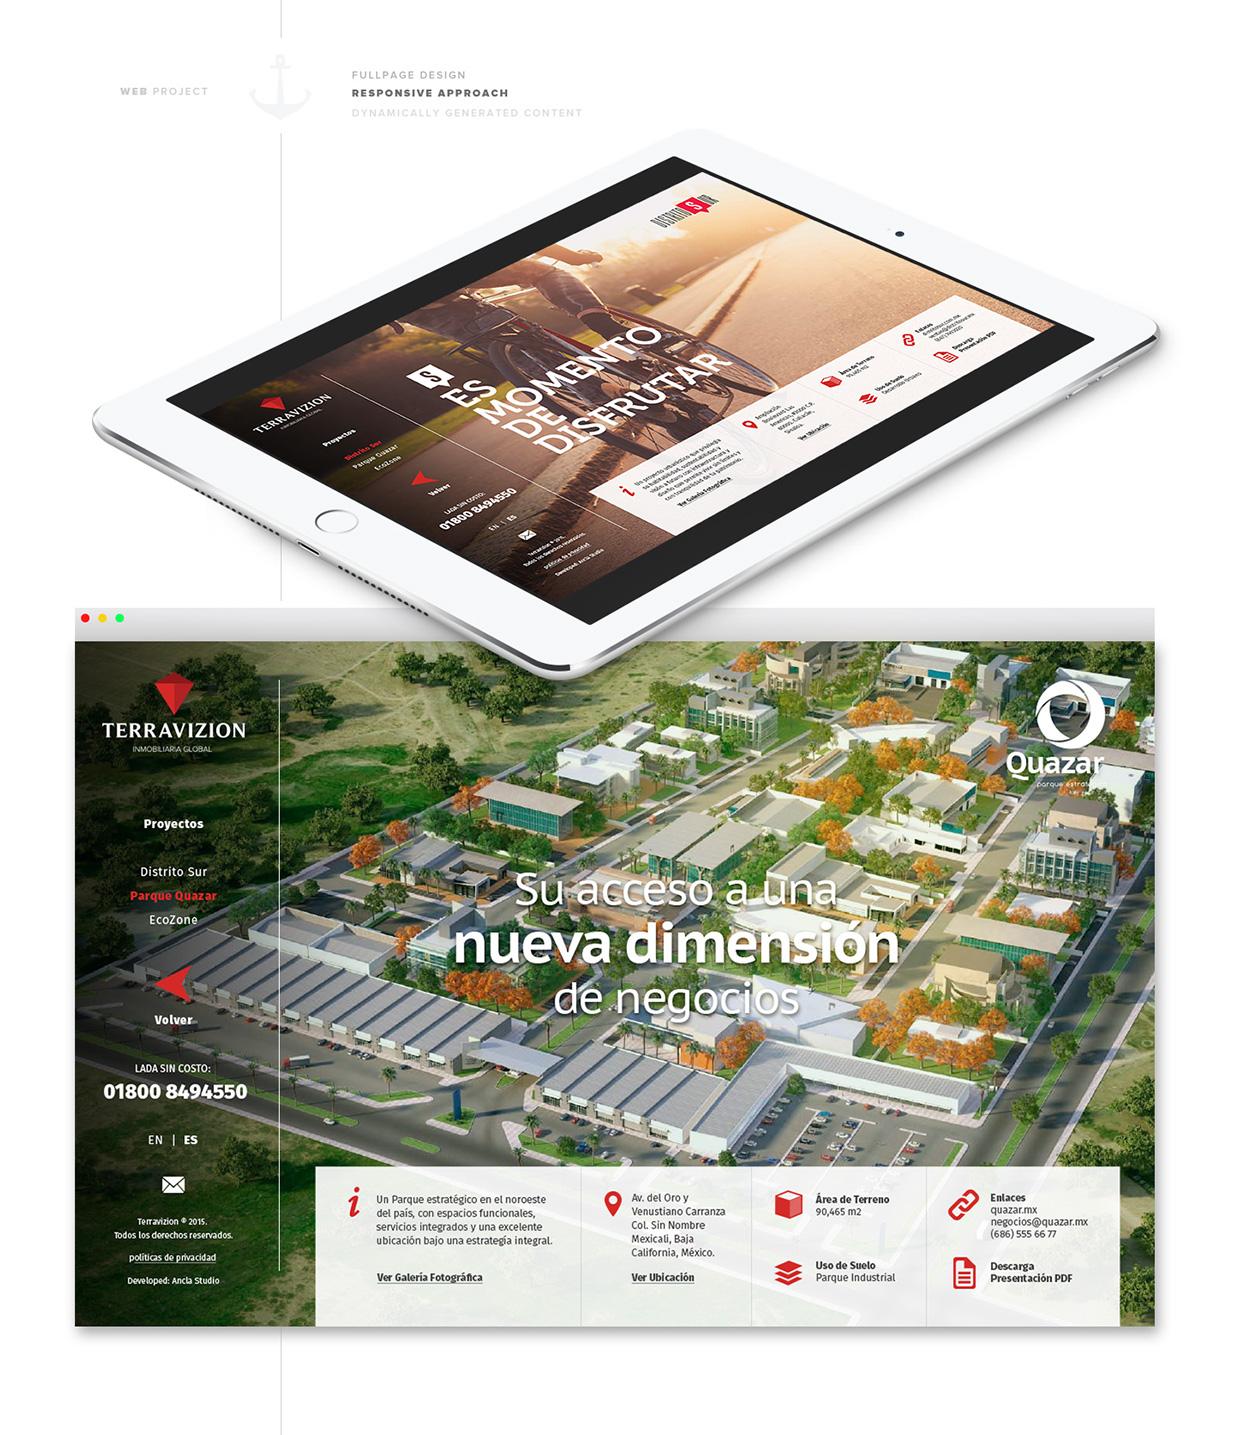 Terravizion Inmobiliaria Global